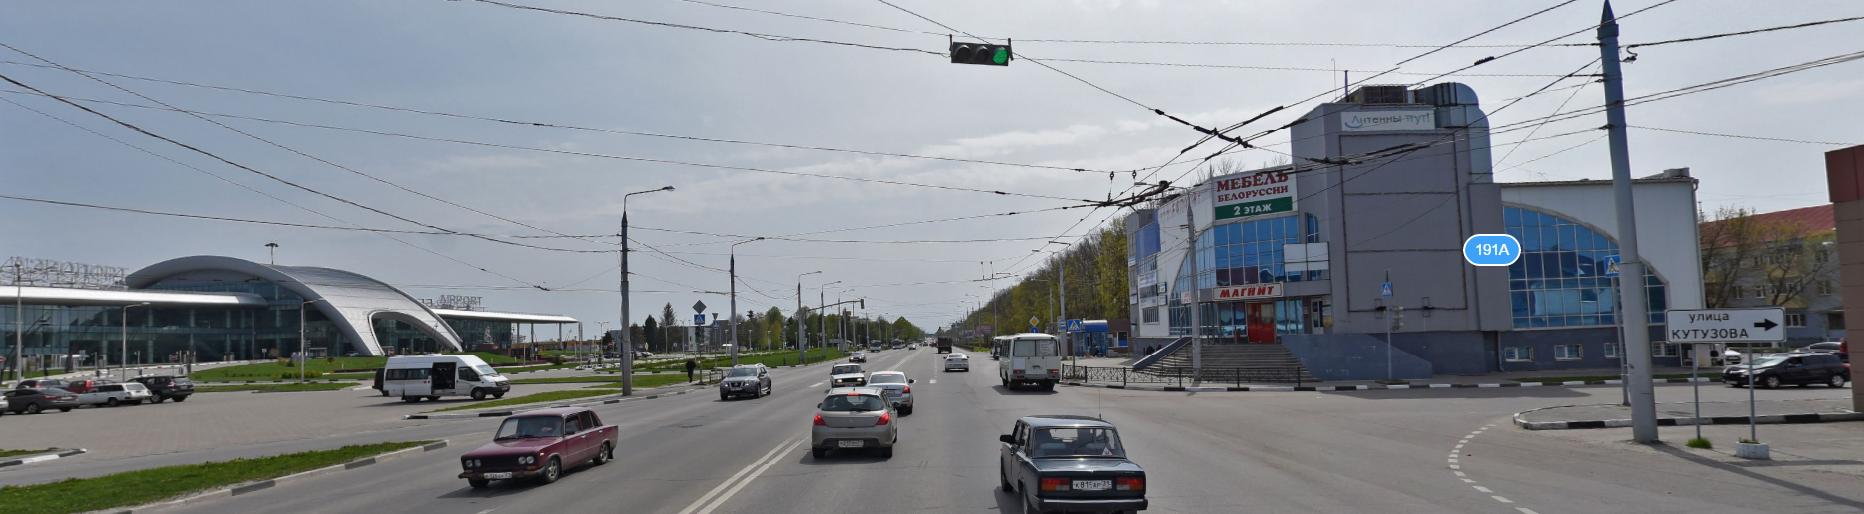 схема проезда к аэропорту города белгорода